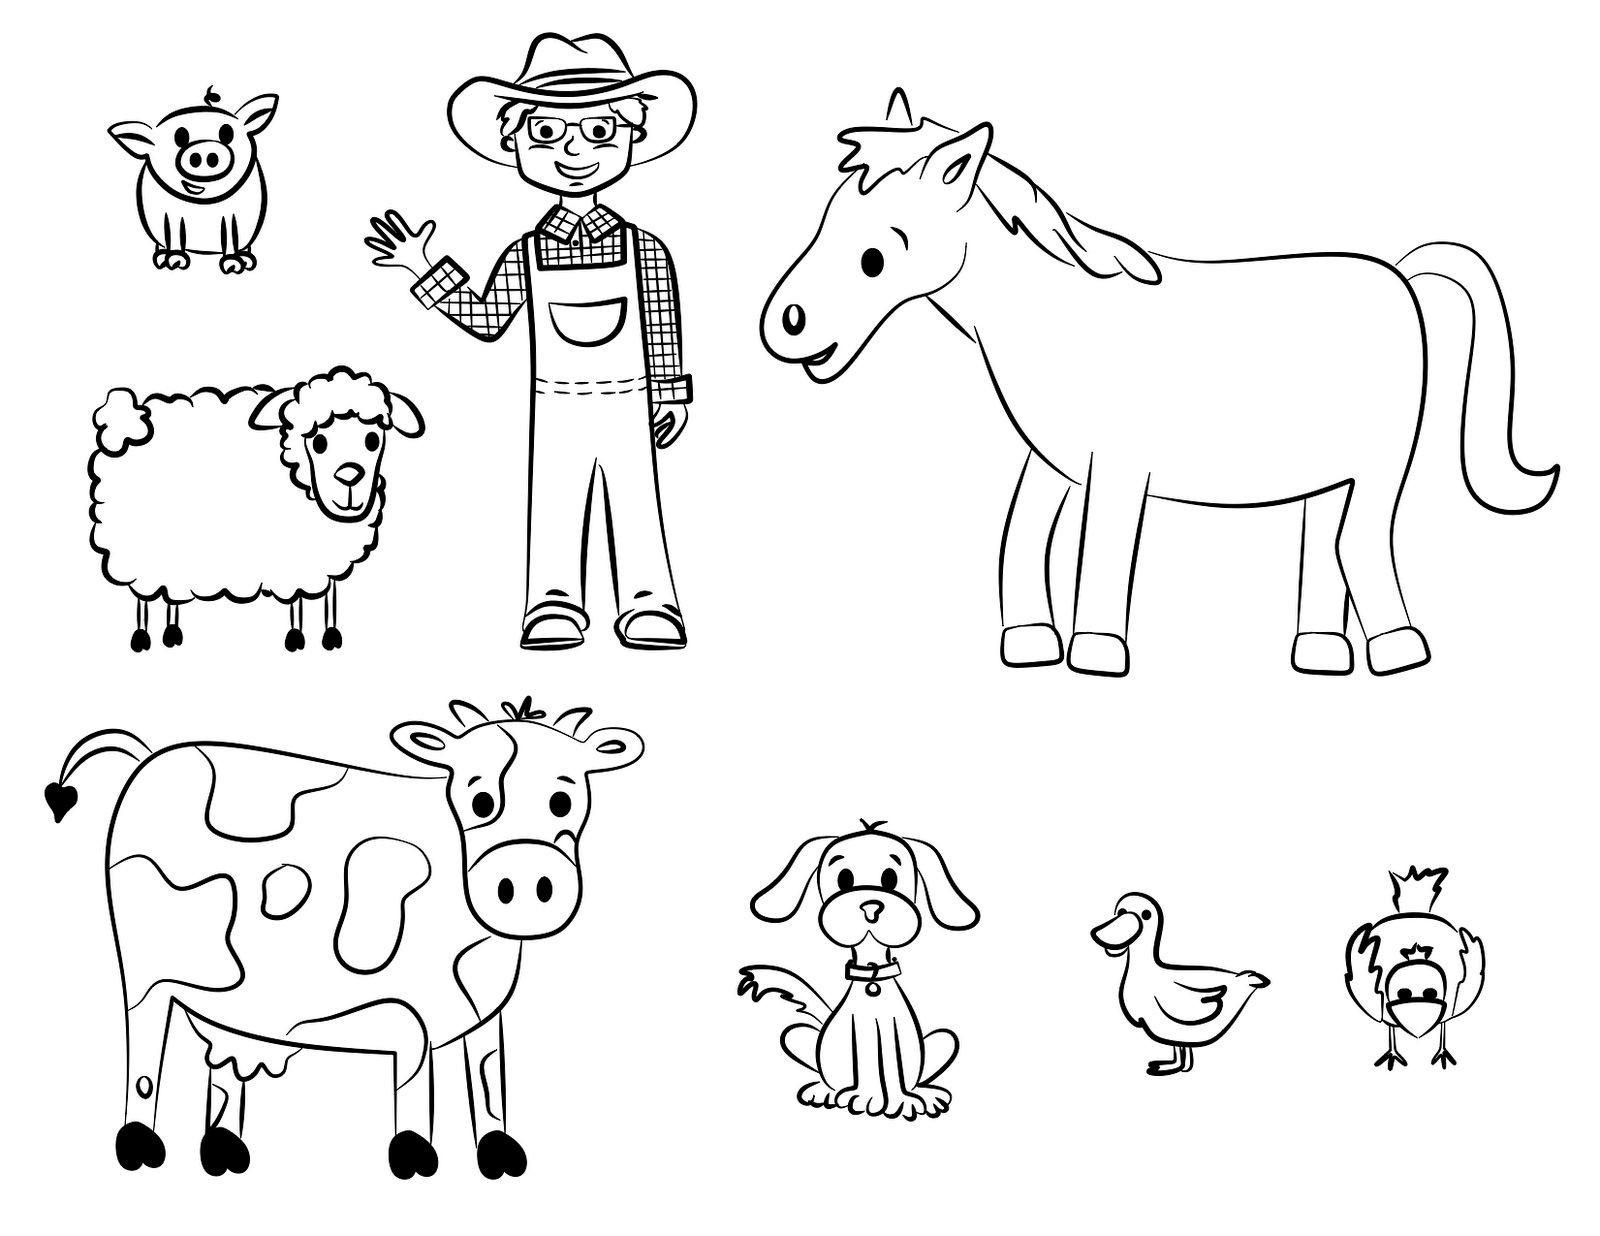 Printable Farm Animals Coloring Pages | Presidencycollegekolkata - Free Printable Farm Animal Pictures